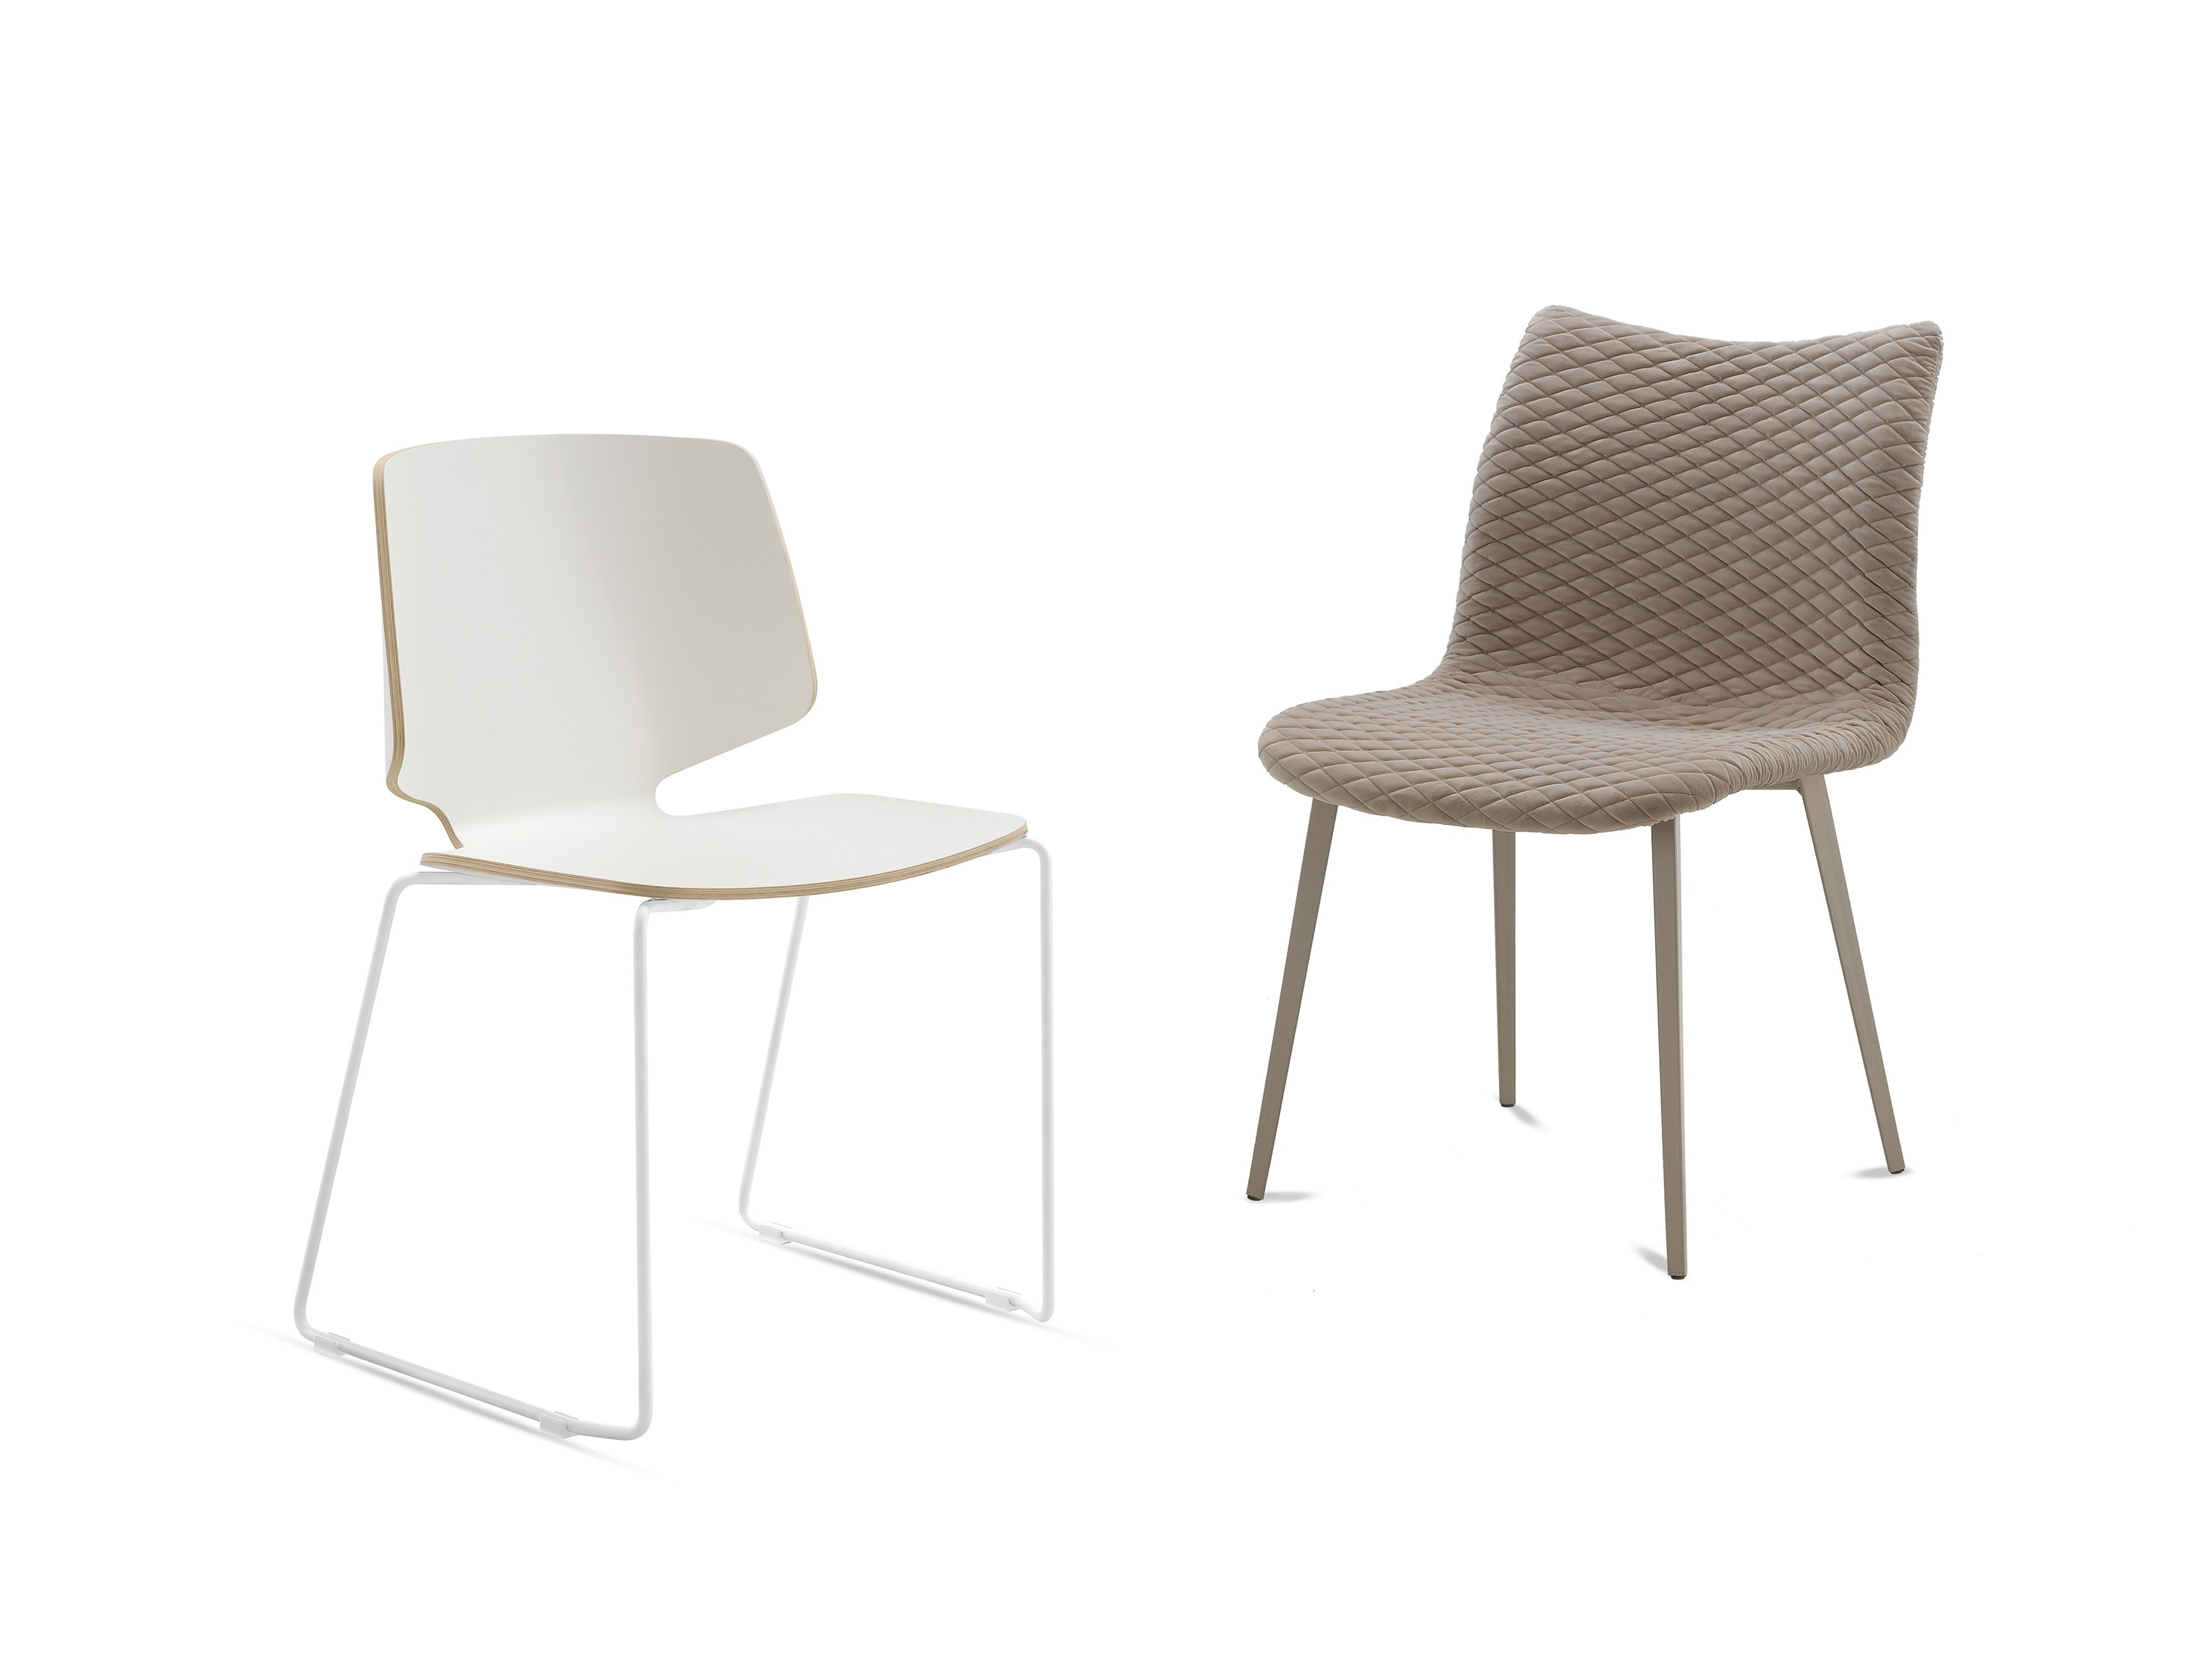 Fly t collezione sedie collection by domitalia design for Sedie fenice design